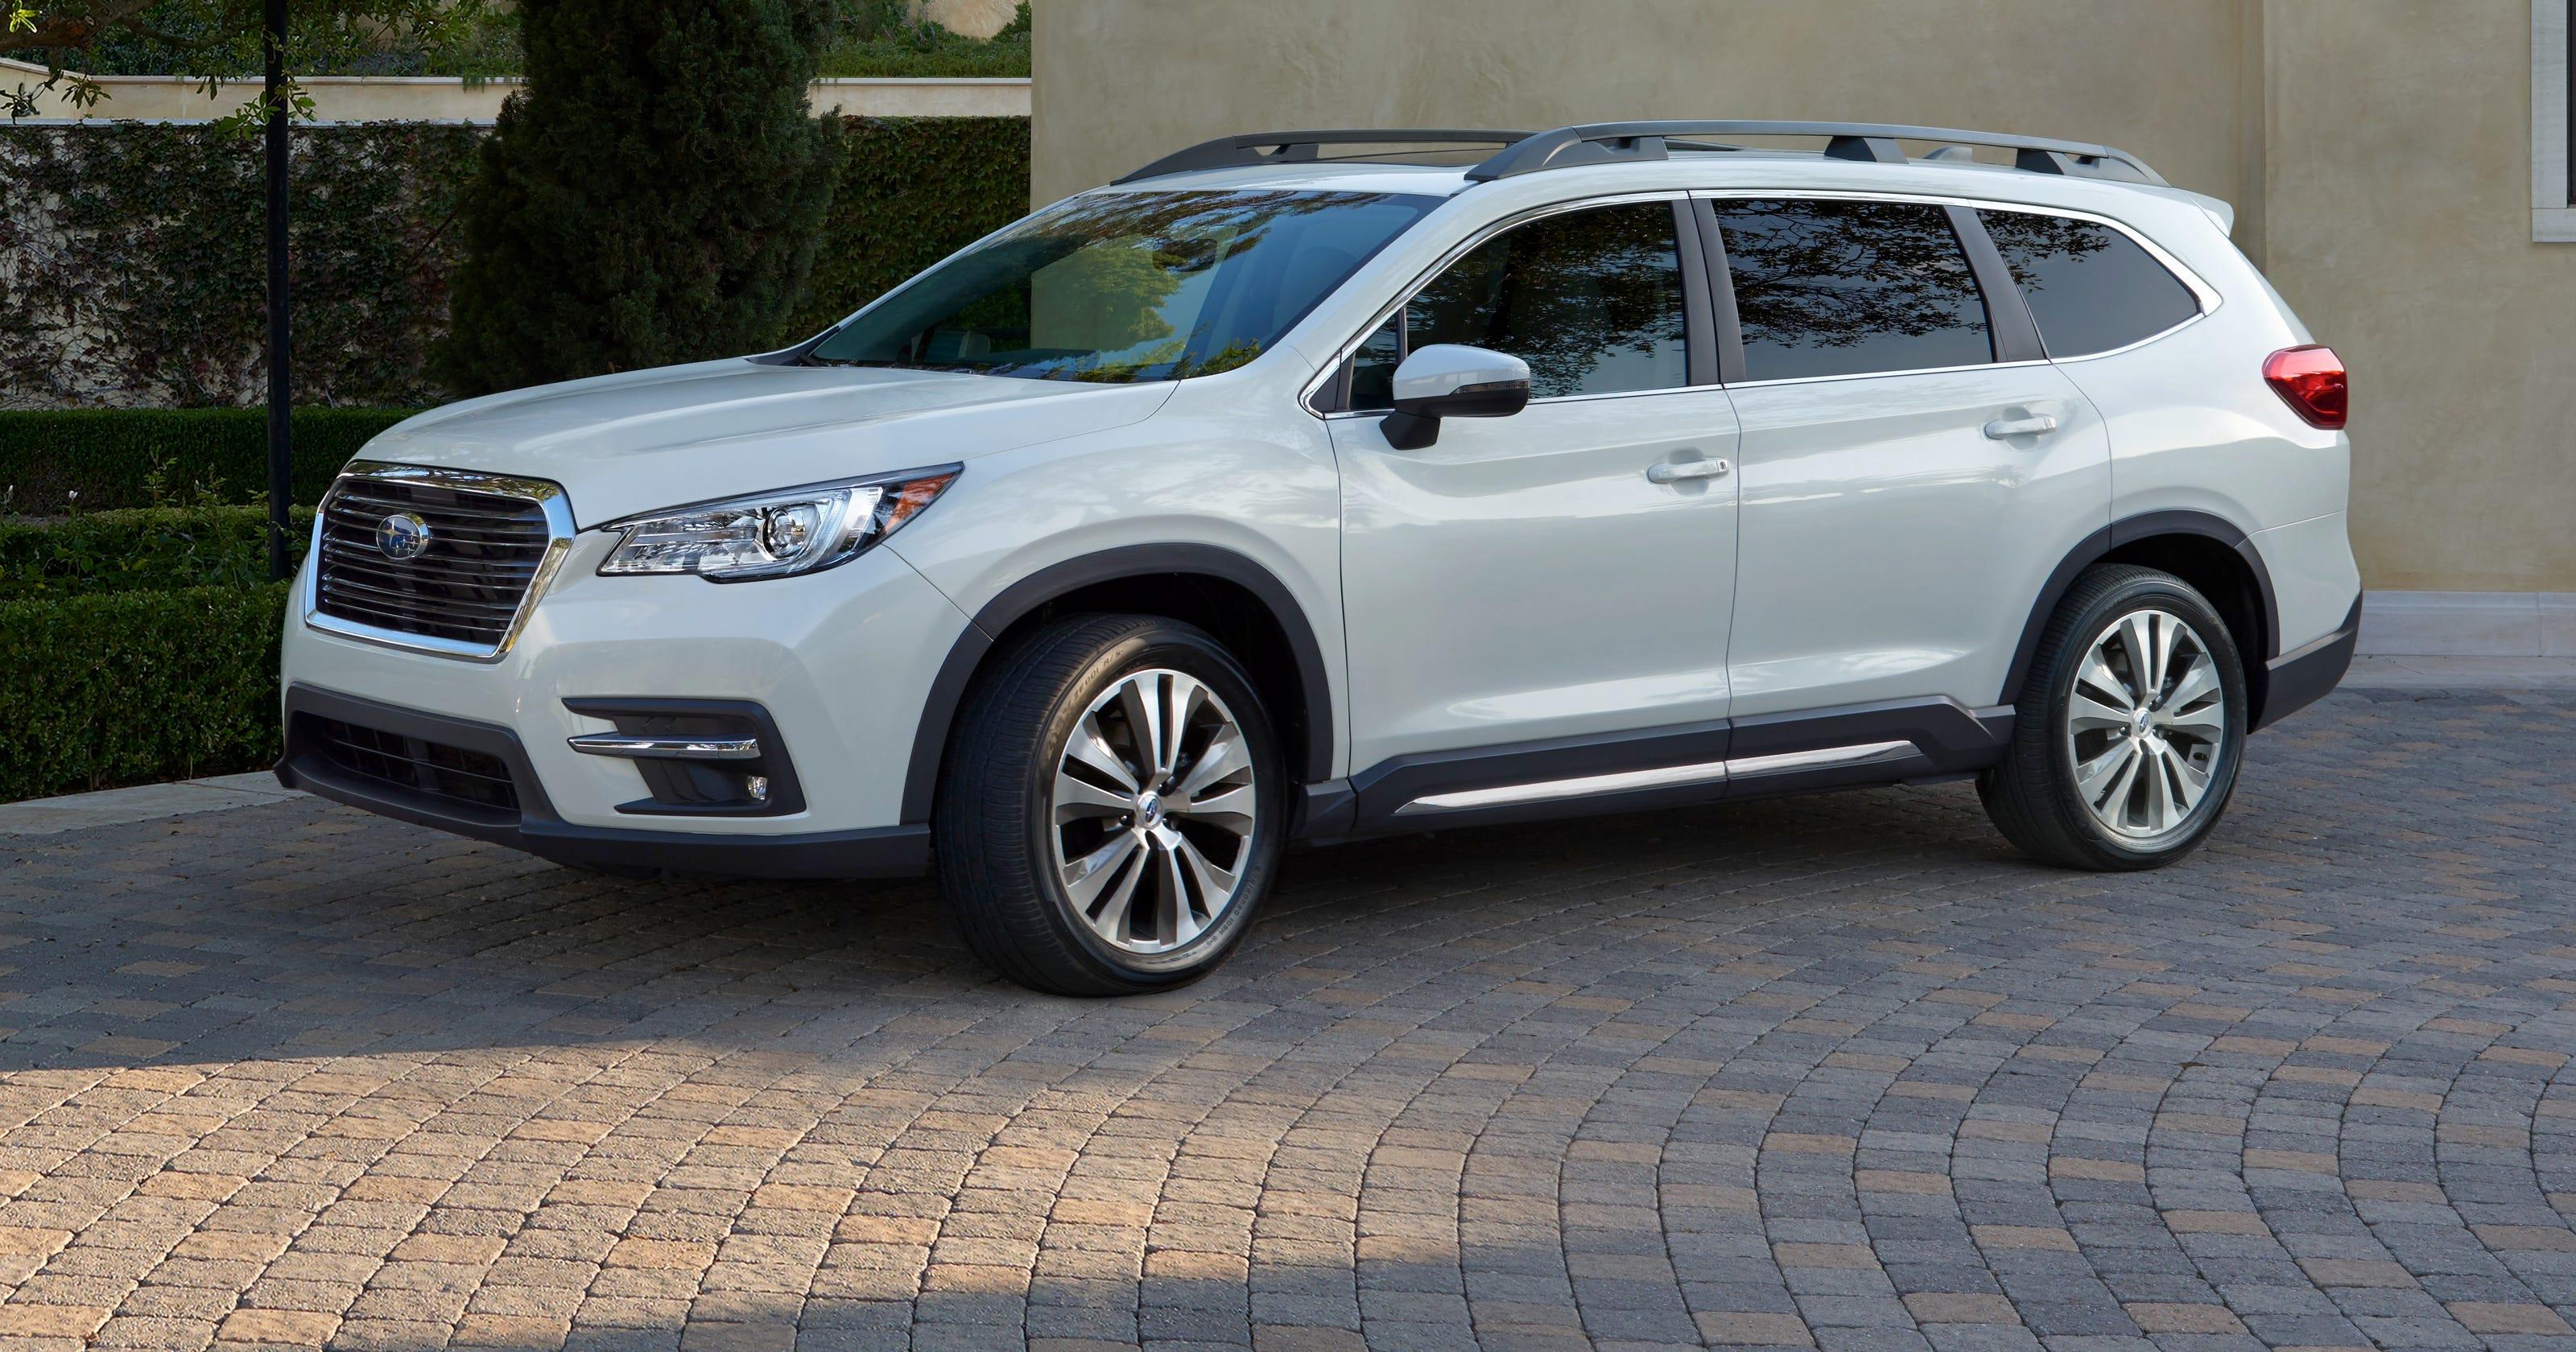 Subaru Bill Pay >> Subaru finally goes big with new Ascent SUV